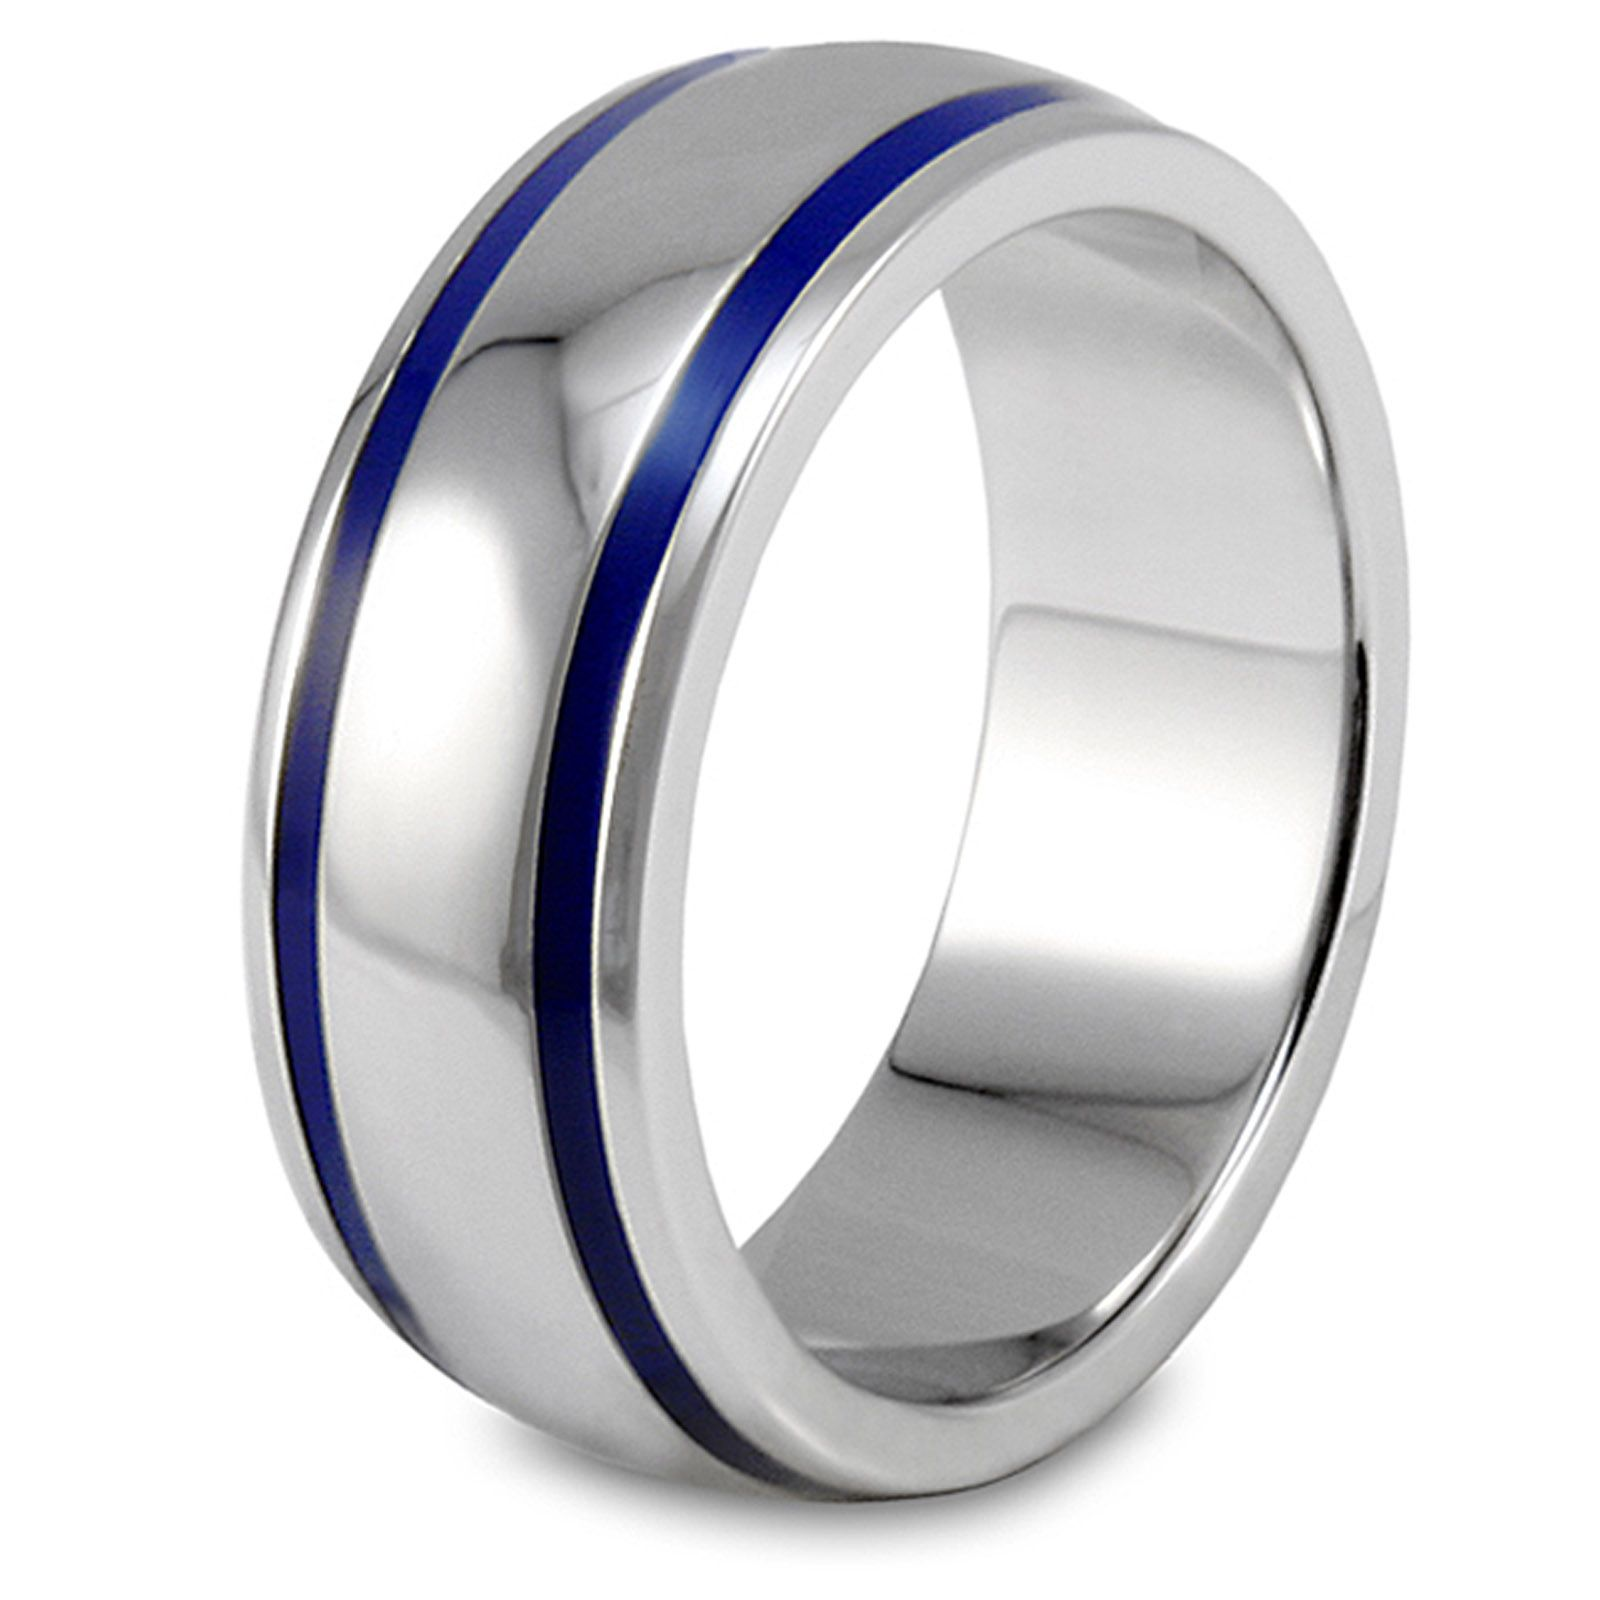 West Coast Jewelry Mens Stainless Steel Blue Enamel